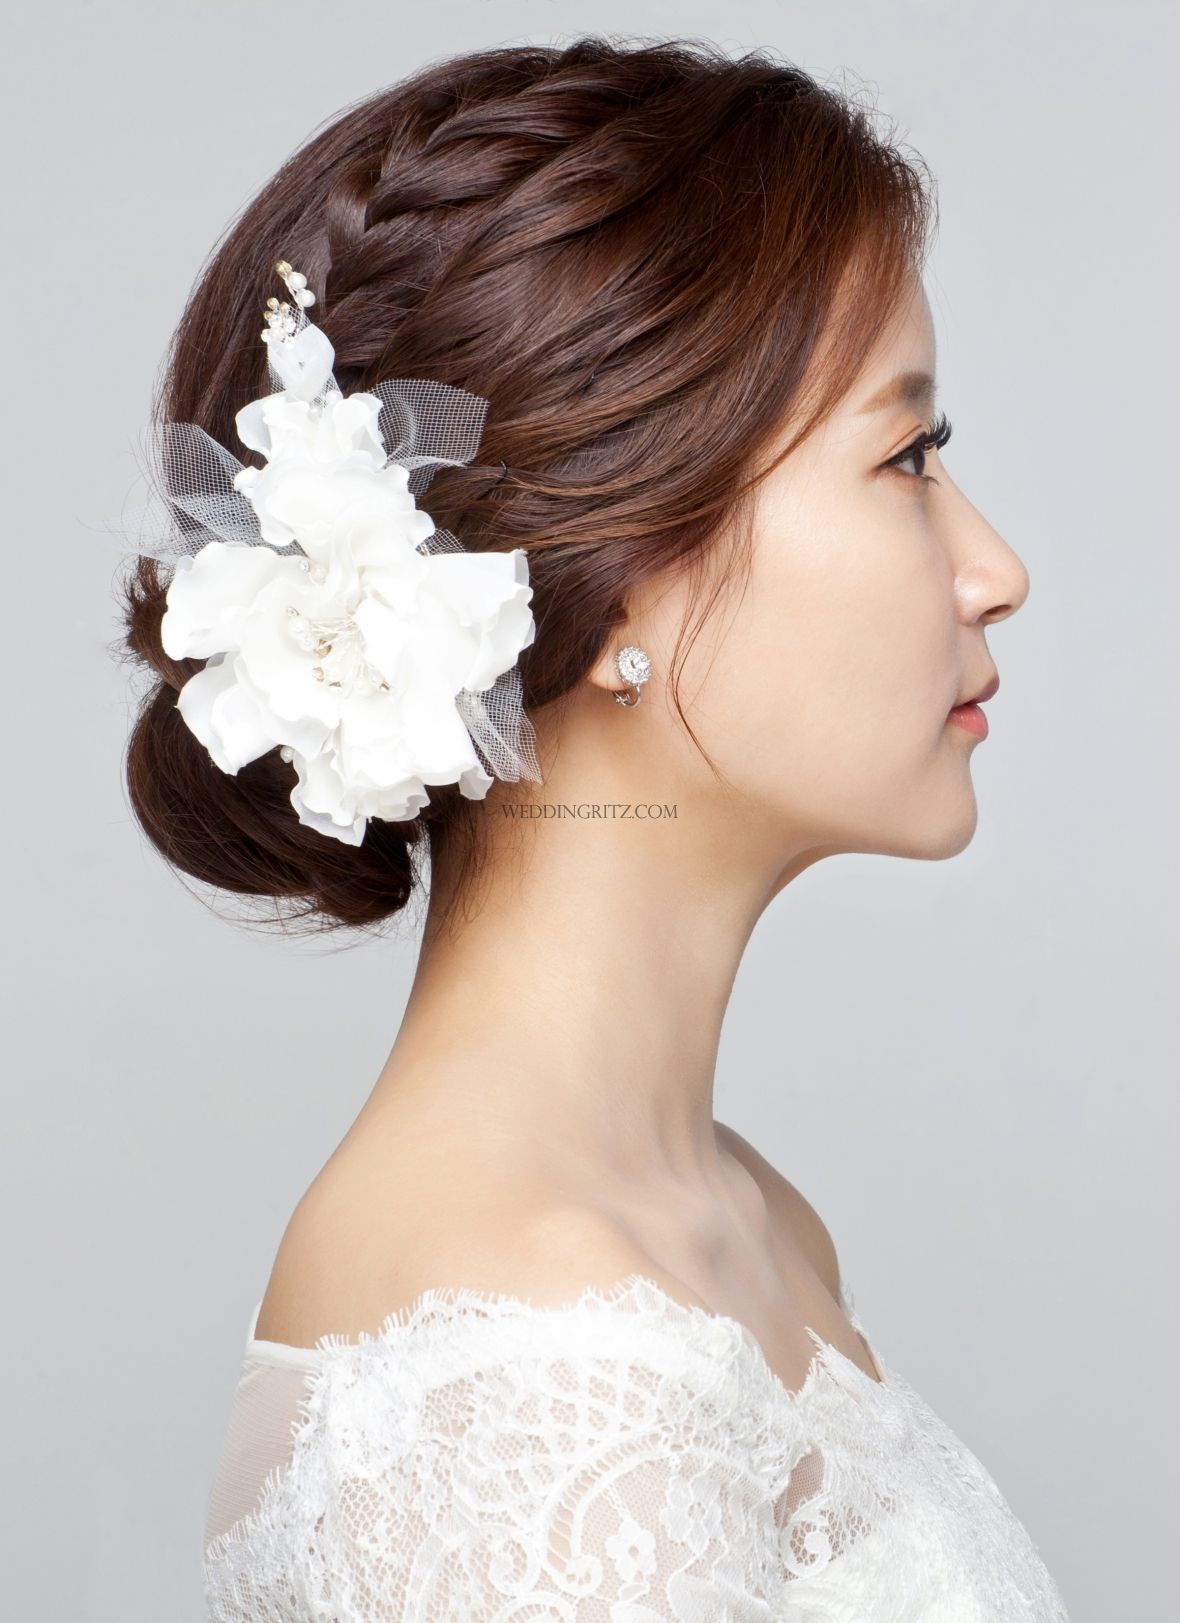 Image result for hair updo with chopsticks or mandarin brocade